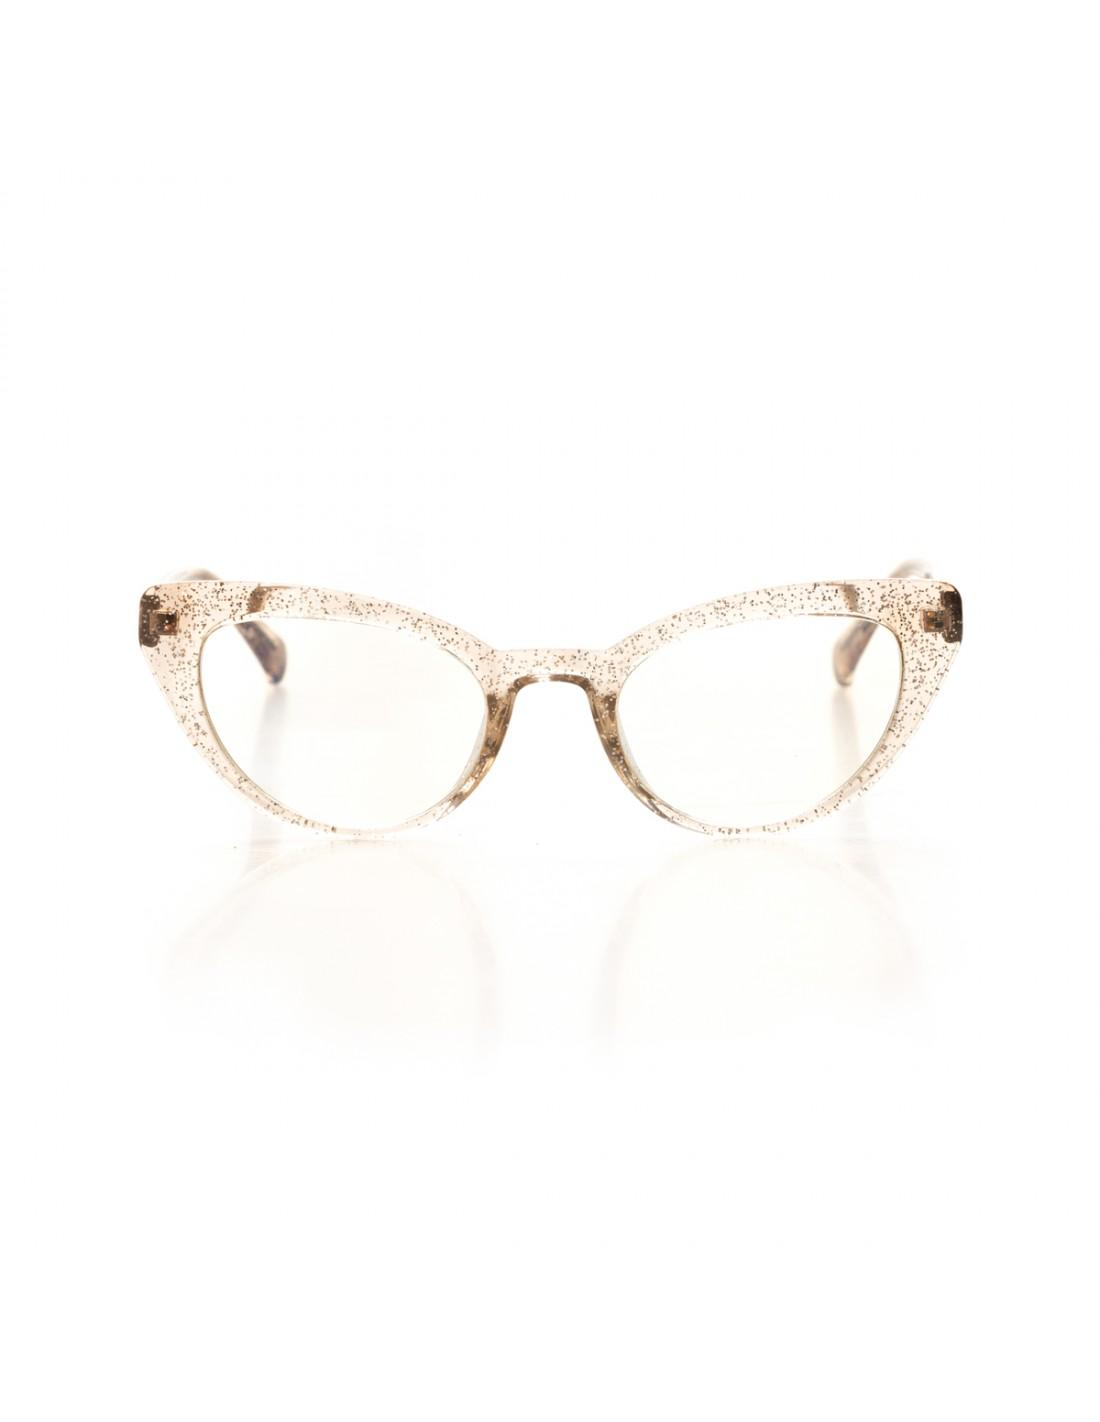 Occhiali da sole da donna trasparenti | Stile vintage online